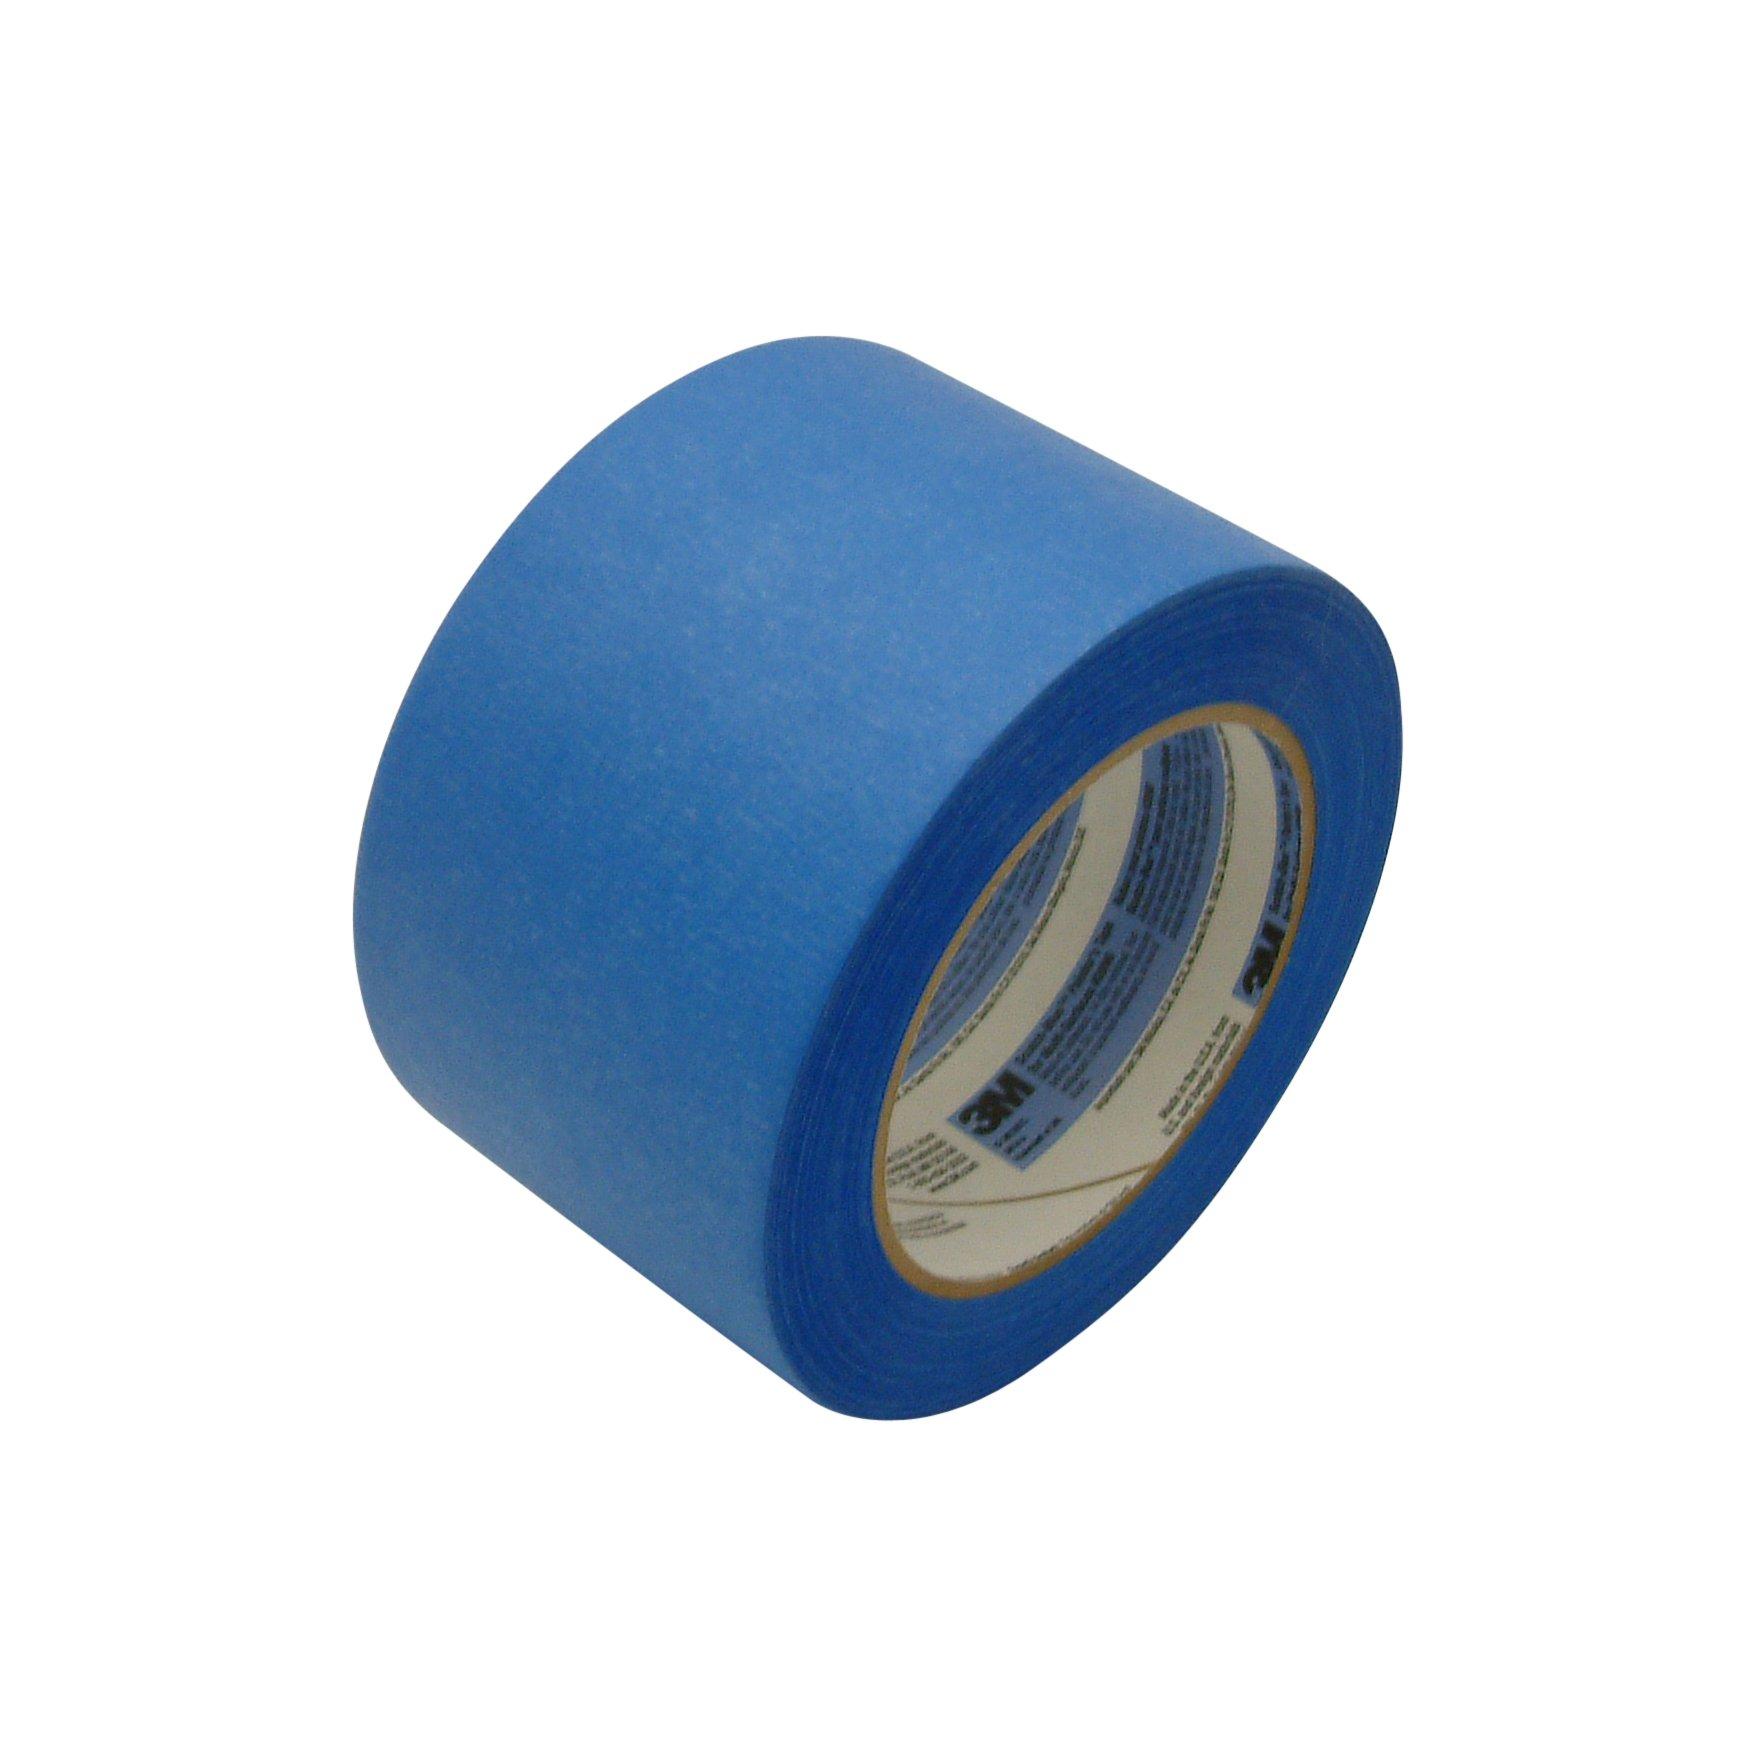 3m Scotch 2090 Blue Painters Tape 3 In X 60 Yds Blue